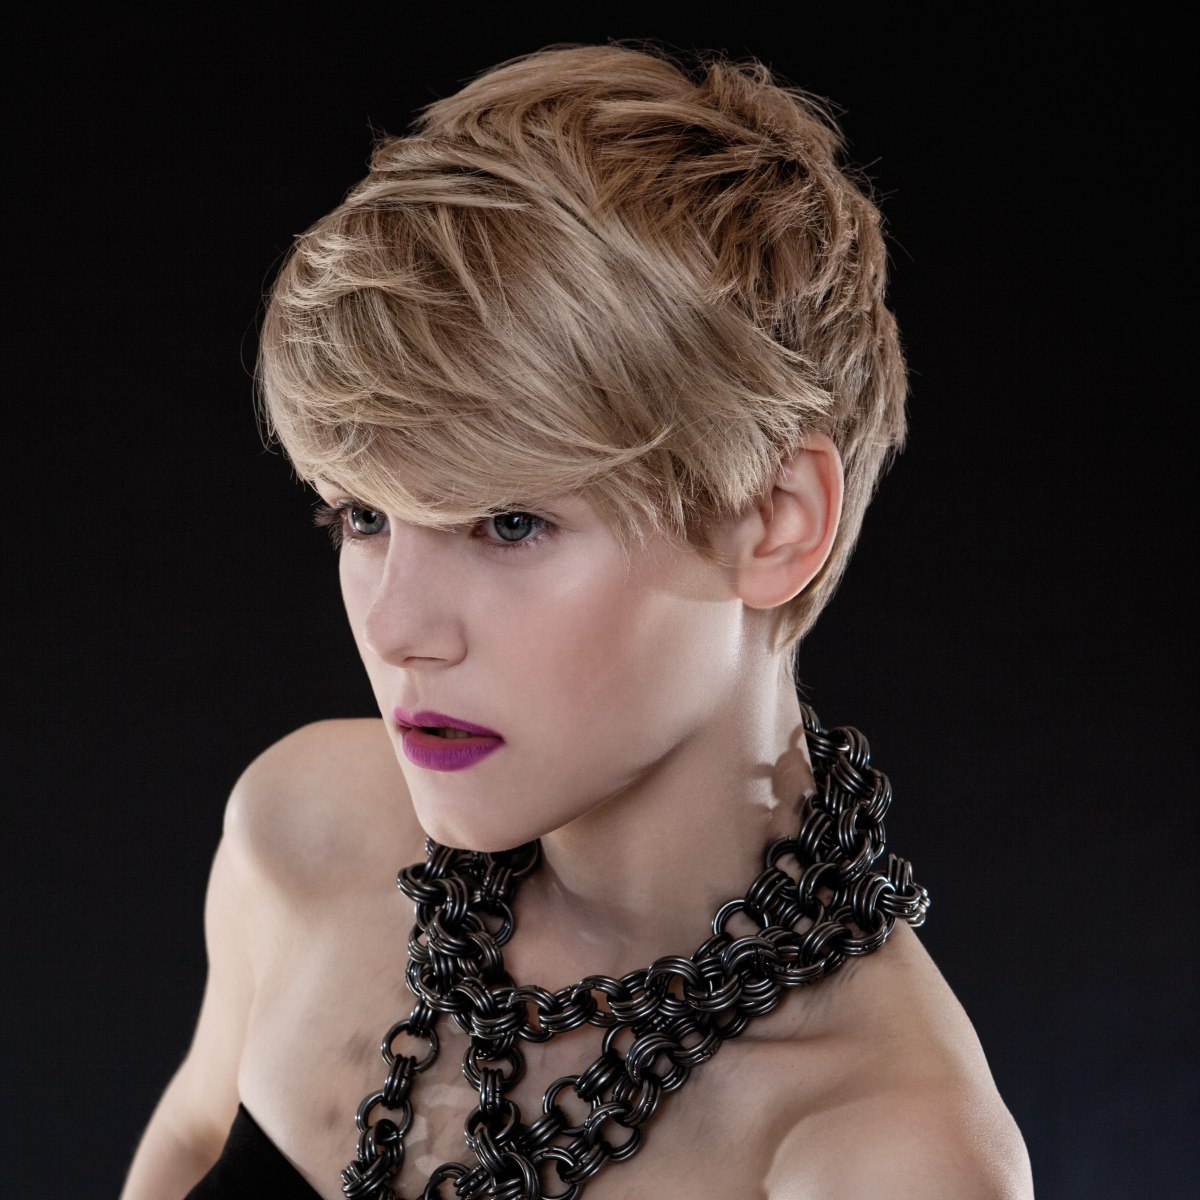 Modern Hairstyles For Short Blond Hair, From Scandinavia